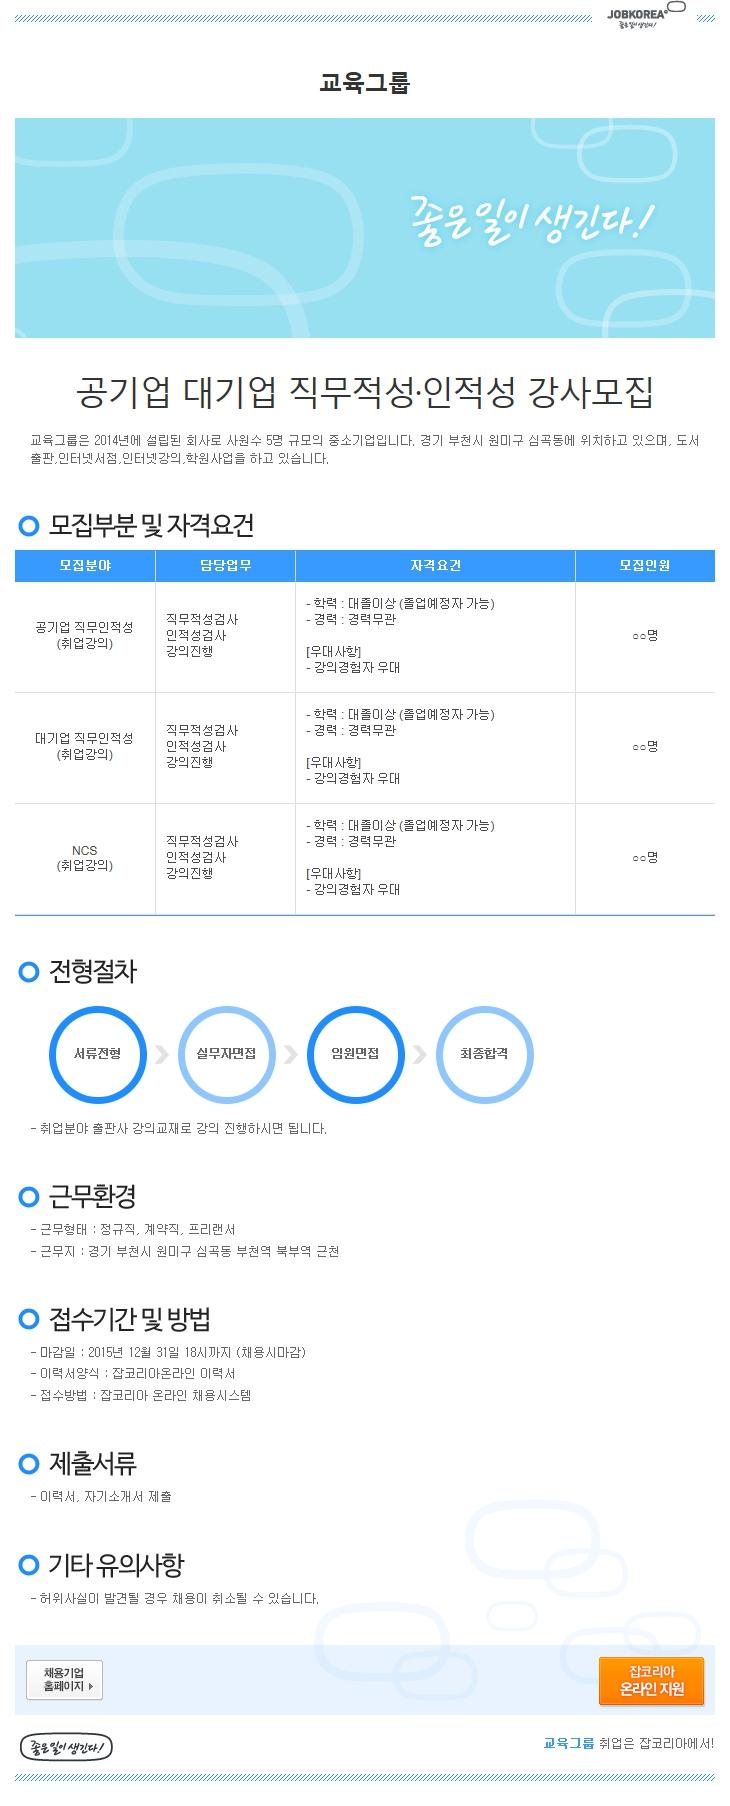 jobkorea_co_kr_20151209_132055.jpg